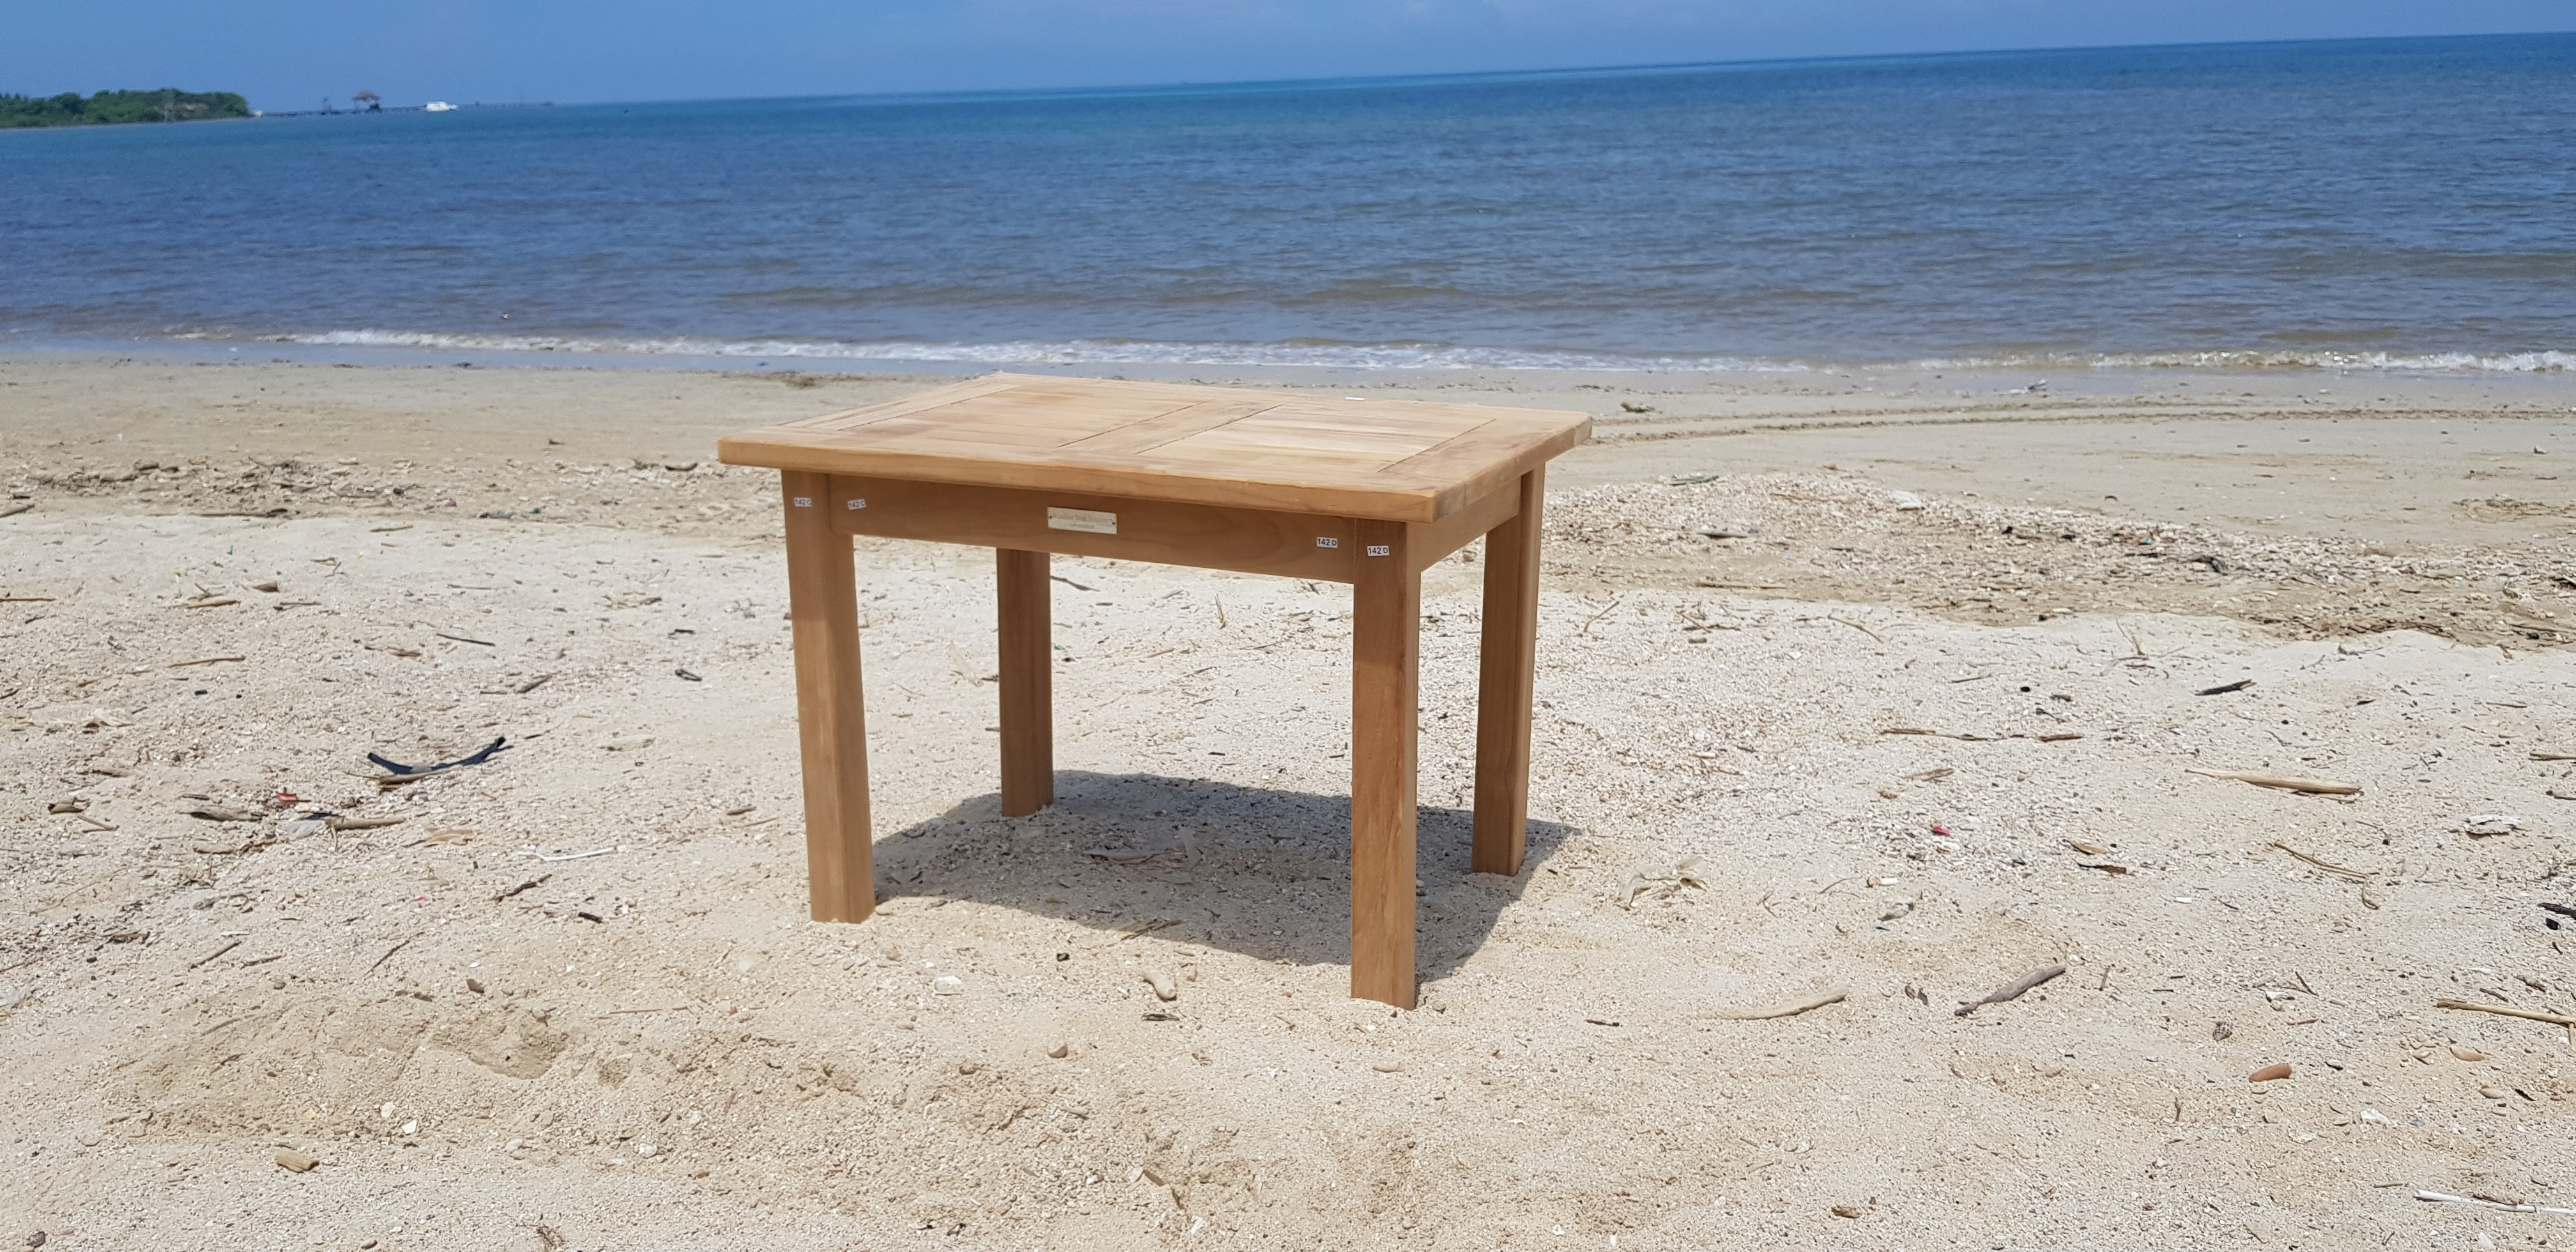 "Cape Cod Rectangular 28"" x 20"" x 20"" Teak Coffee Table"